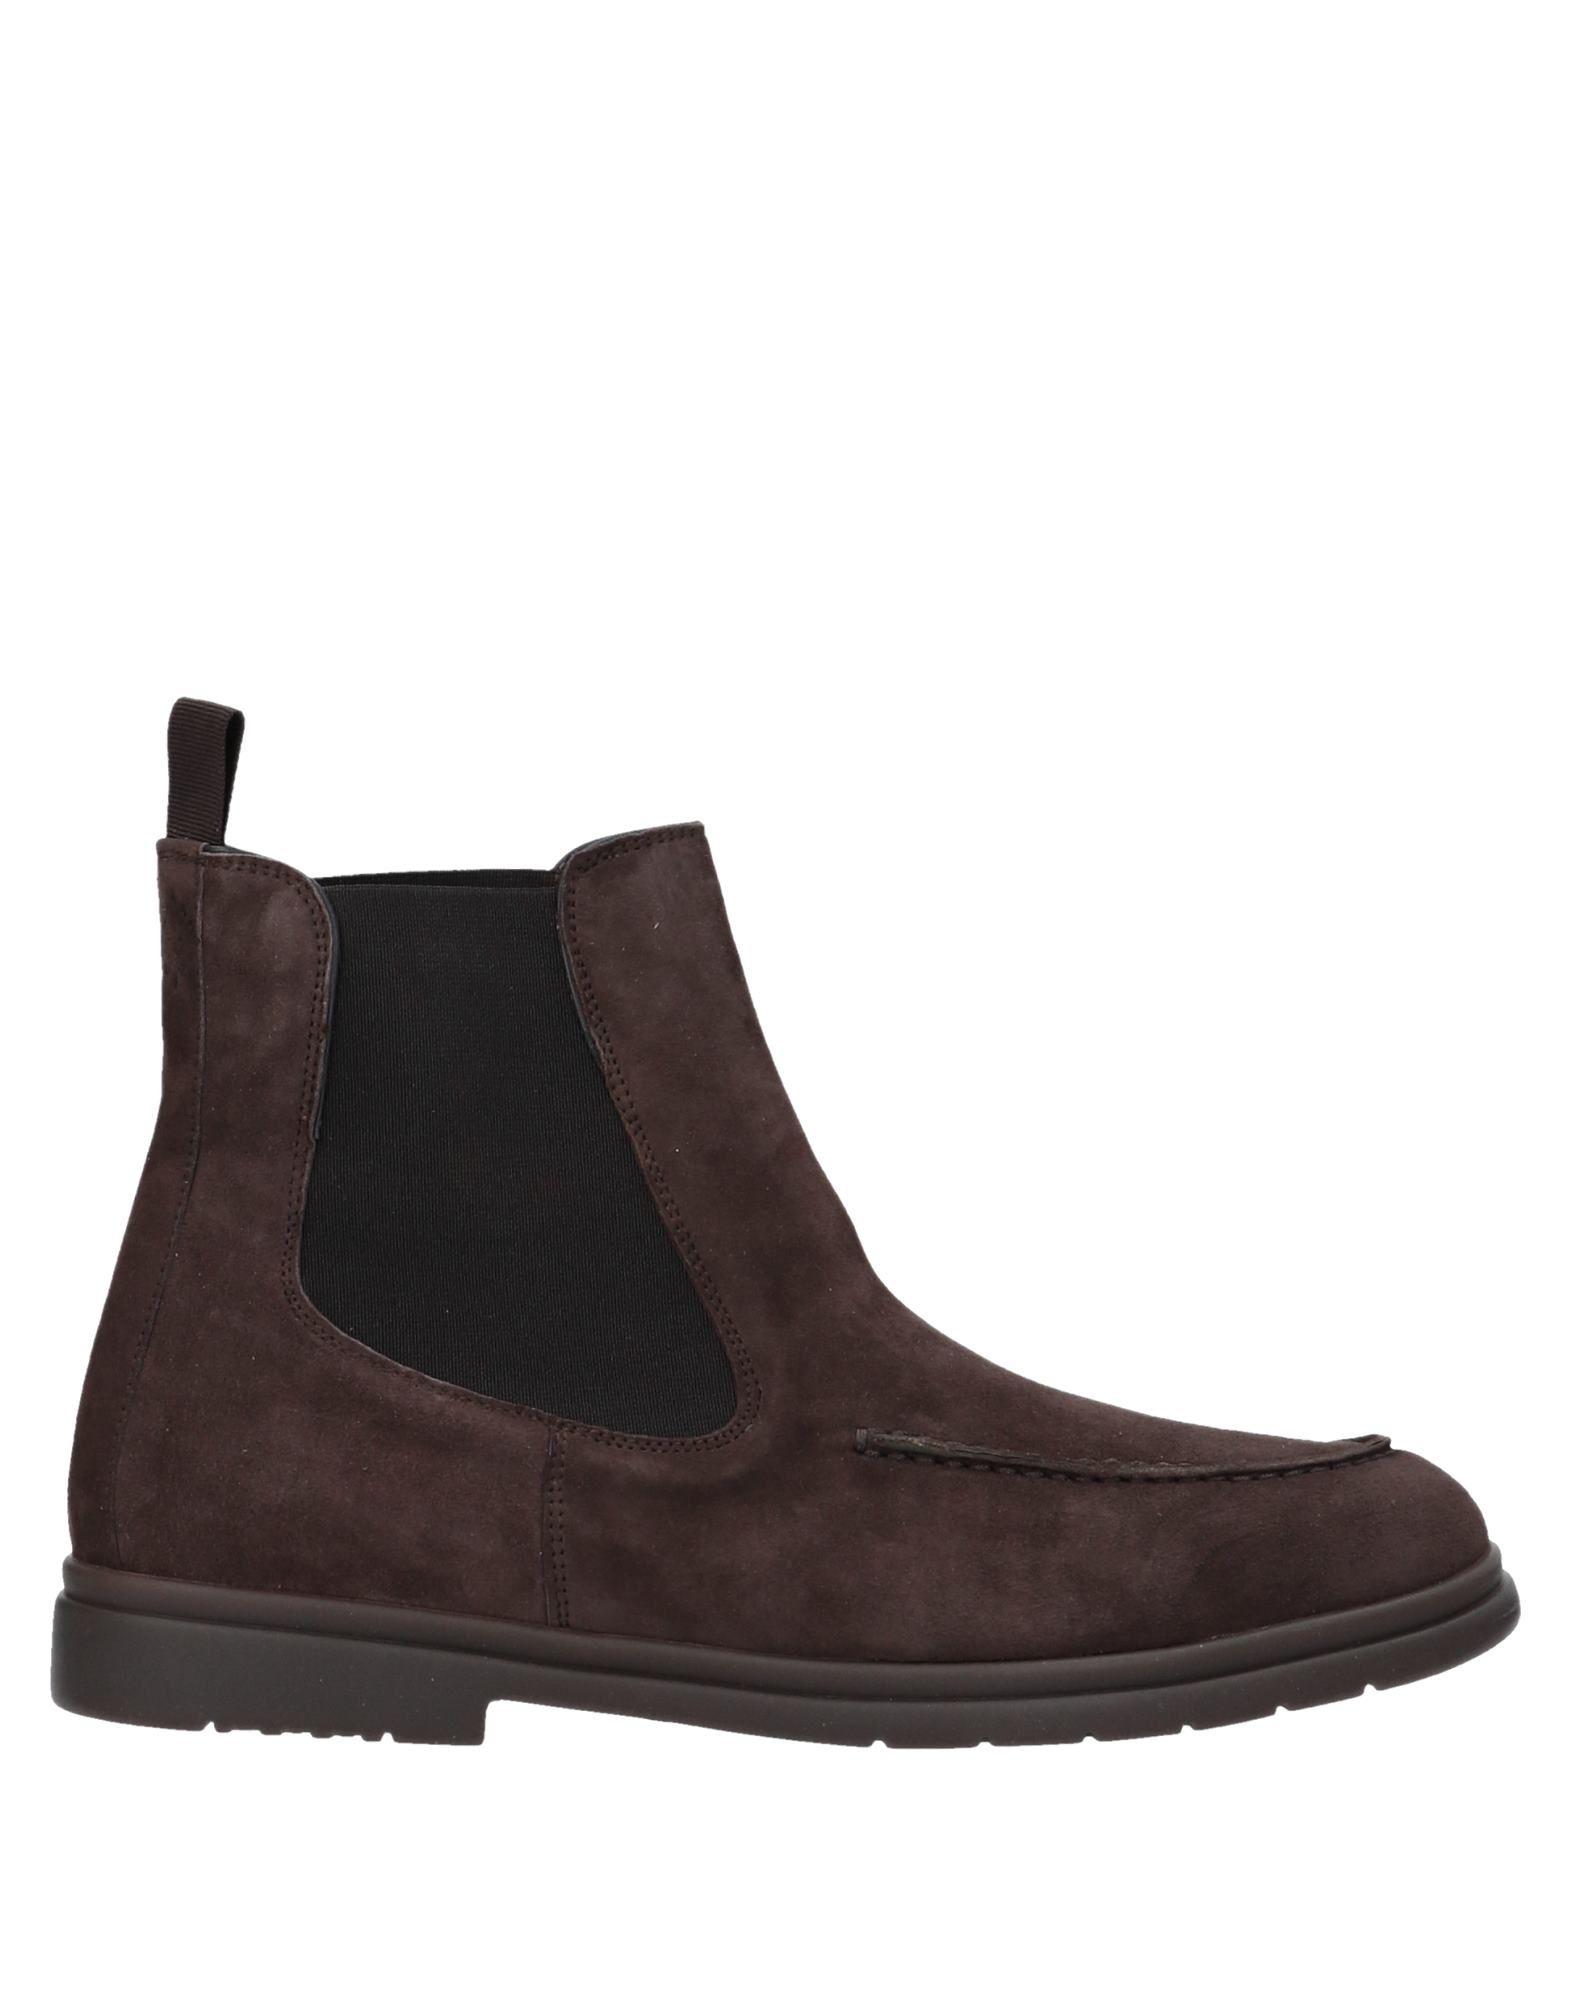 Andrea Ventura Firenze Stiefelette Herren  11531798OI Gute Qualität beliebte Schuhe